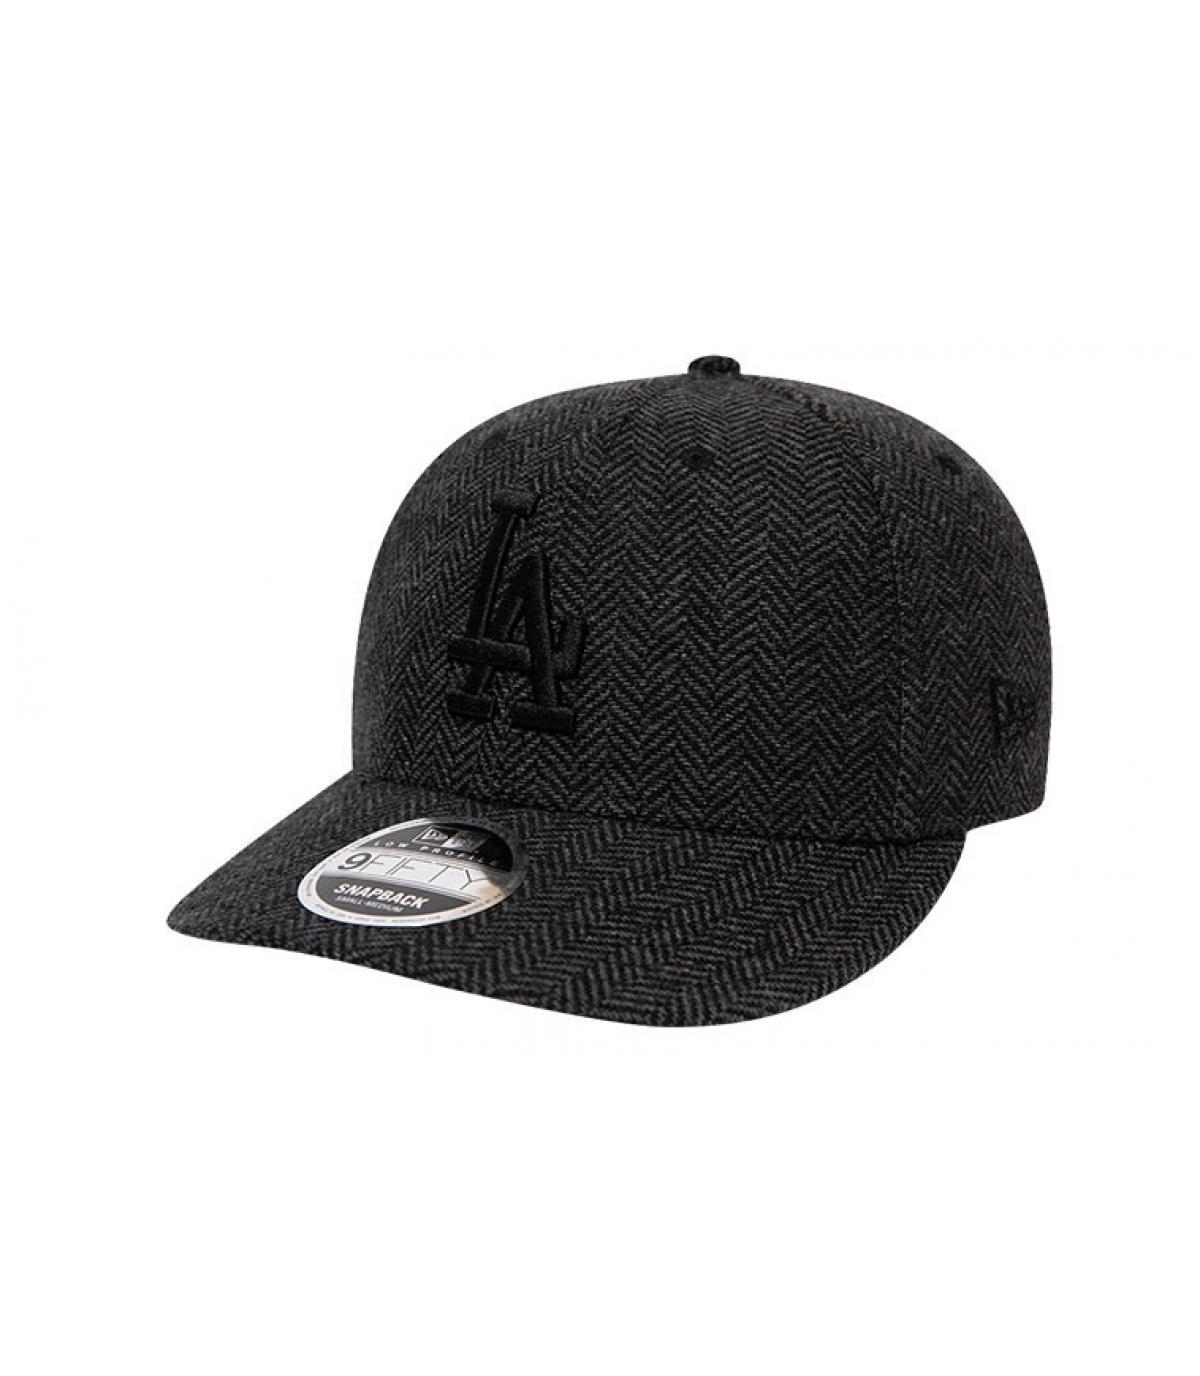 Details MLB Tweed LA 950 black - afbeeling 2